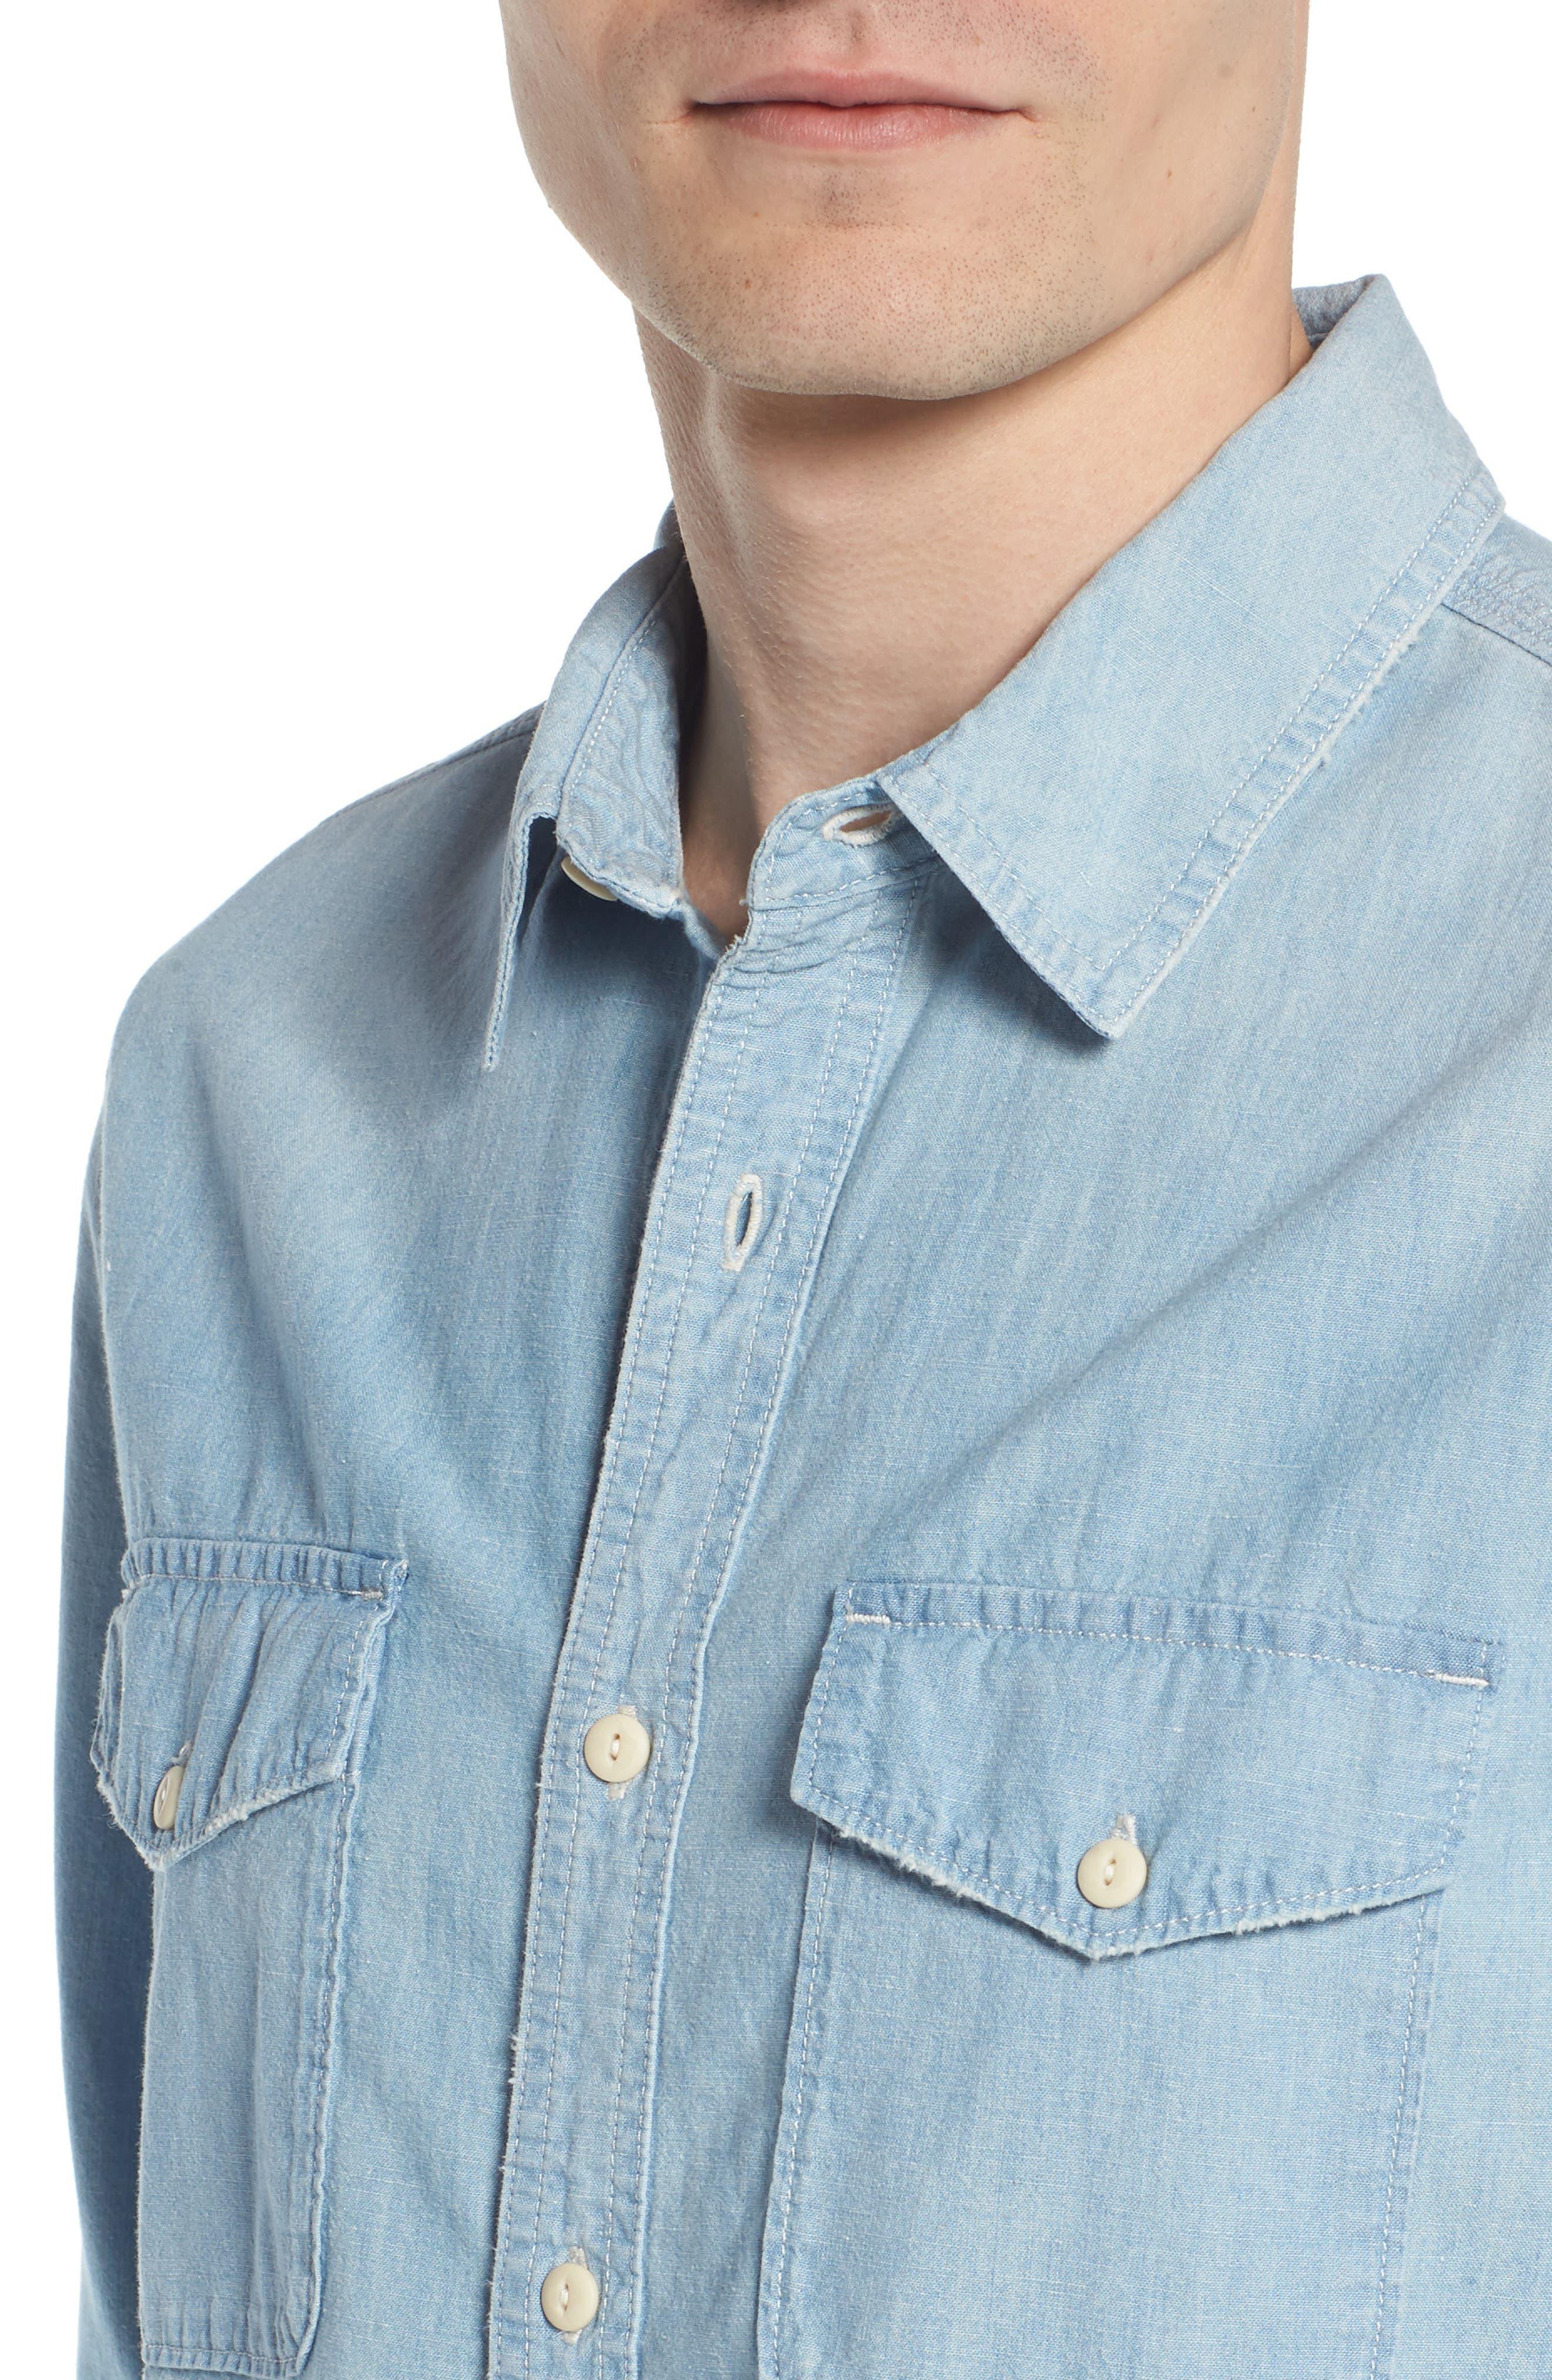 Benning Regular Fit Sport Shirt,                             Alternate thumbnail 2, color,                             Roadstead